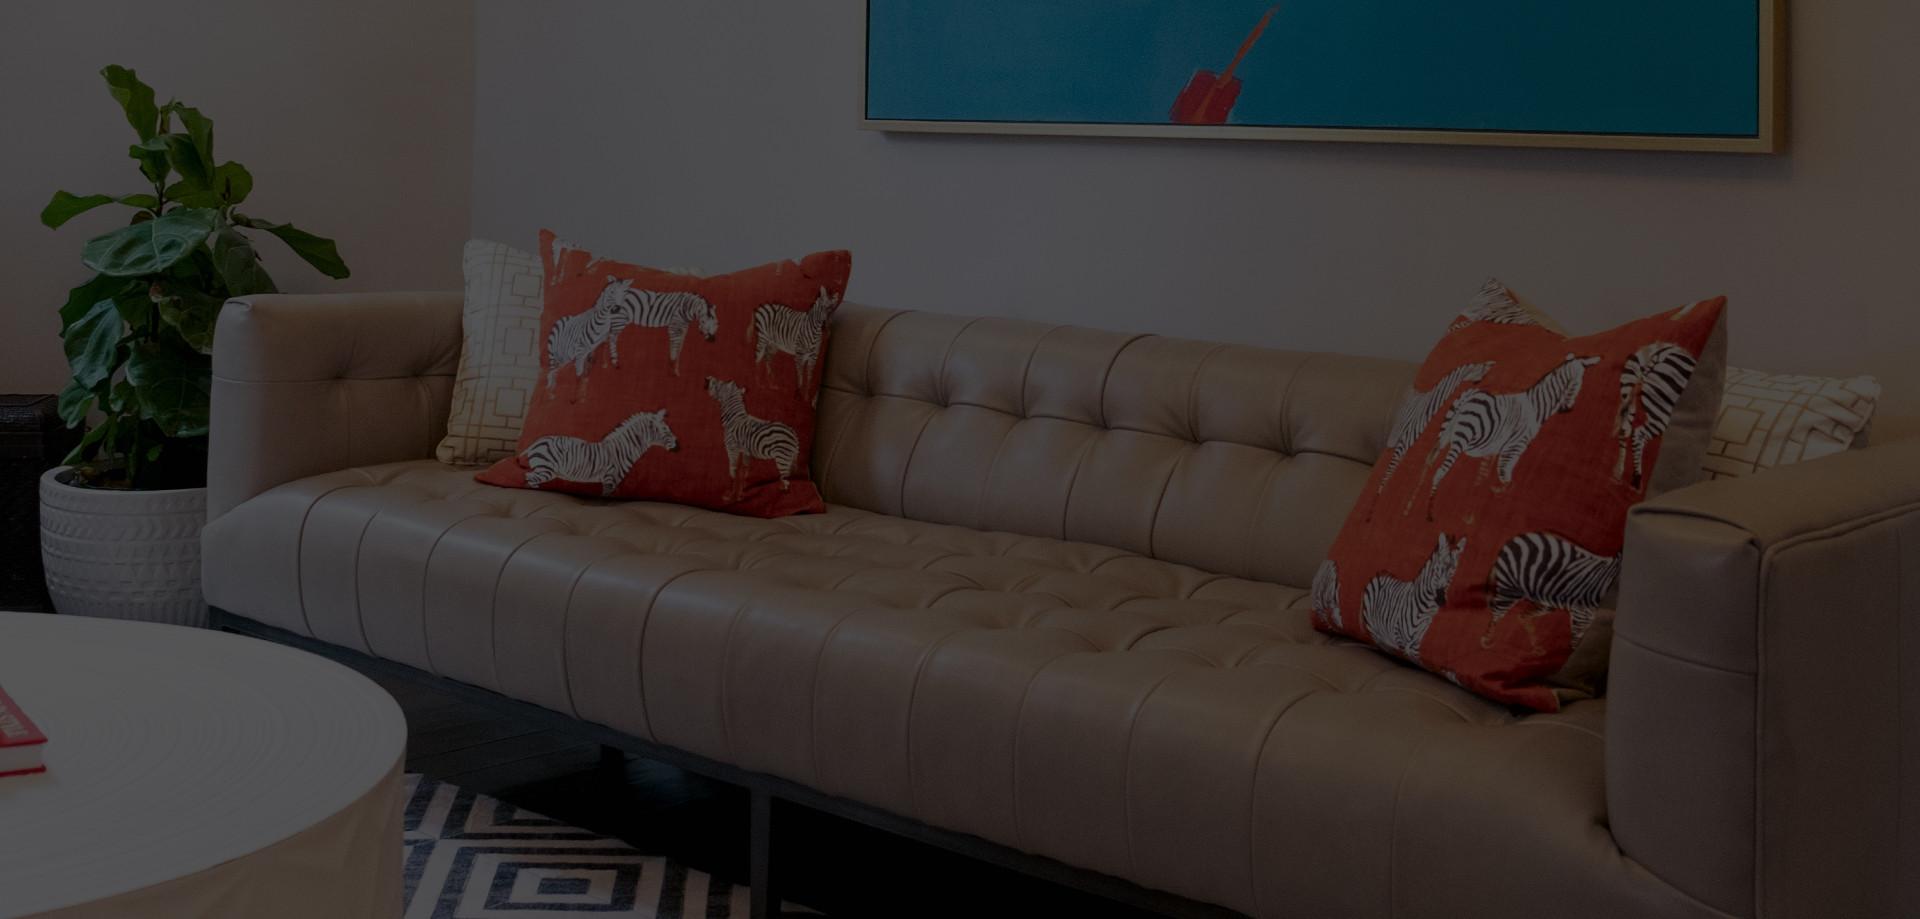 Closeup of Sofa and Coffee Table